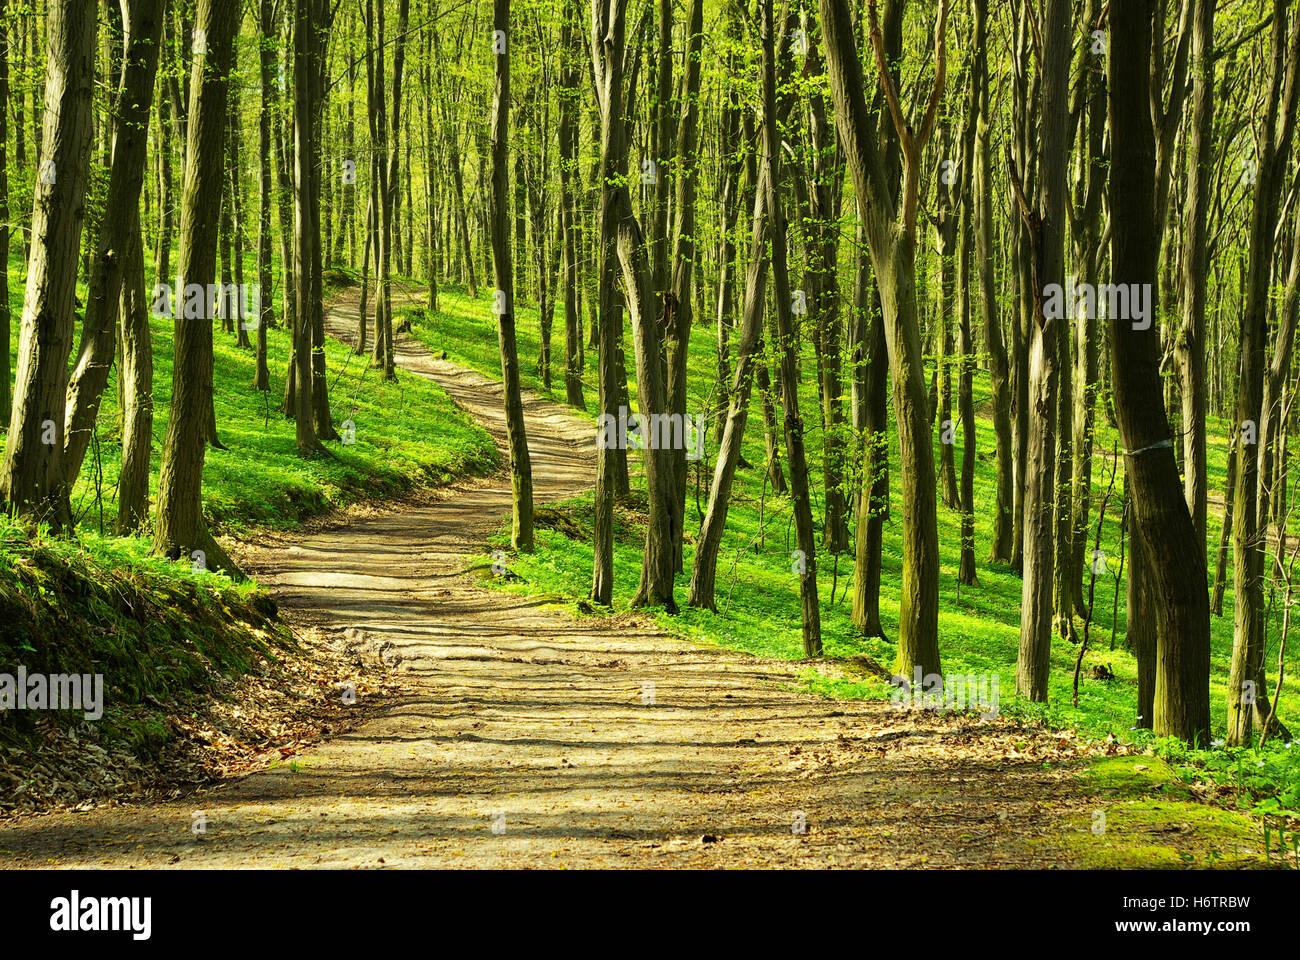 tree trees sunlight spring bouncing bounces hop skipping frisks jumping jump woods spiritual plants divine wilderness - Stock Image